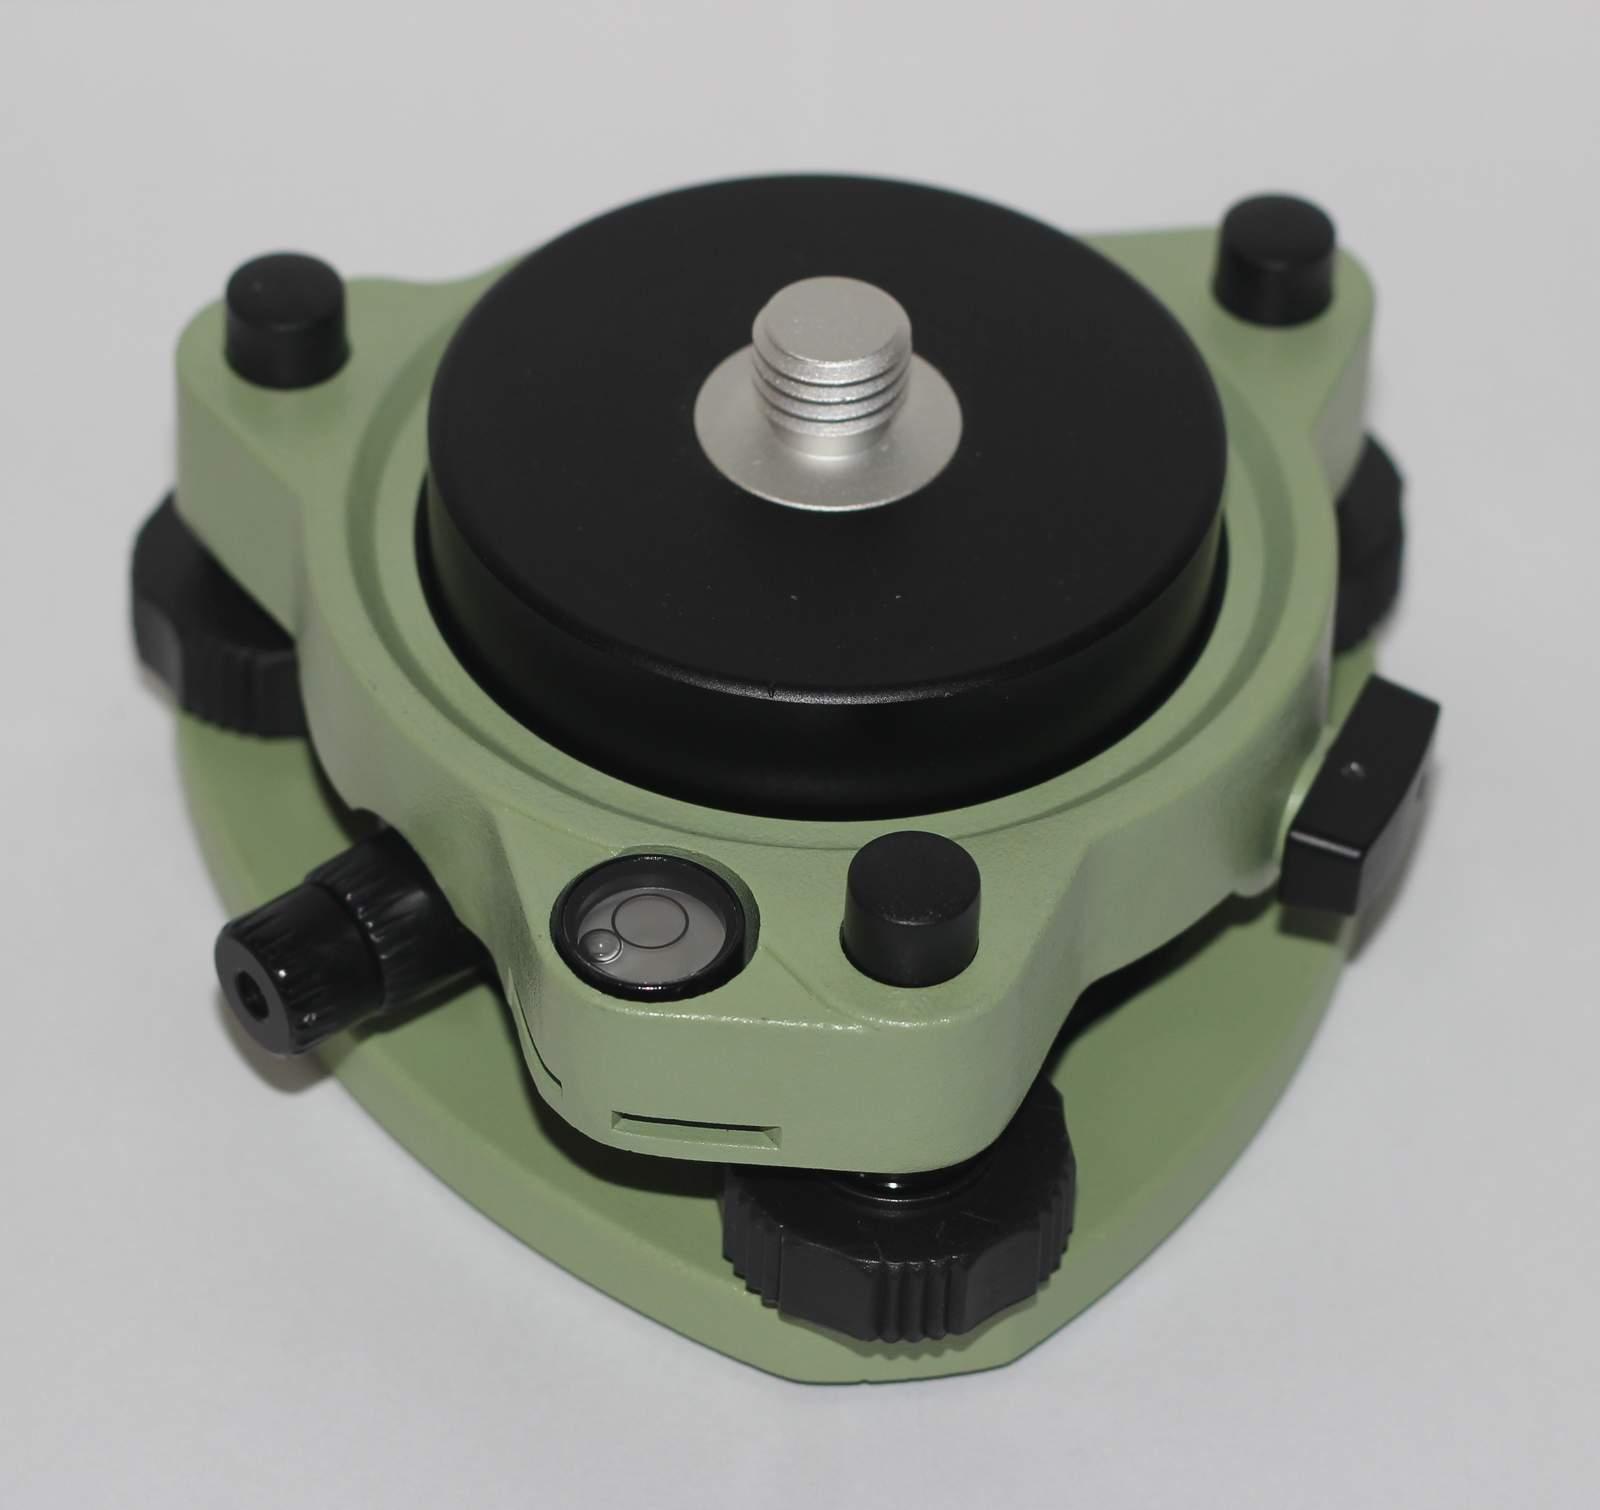 "NEW Tribrach w/Optical Plummet & Rotating Adapter 5/8""x11 Mount for GPS PRISM"